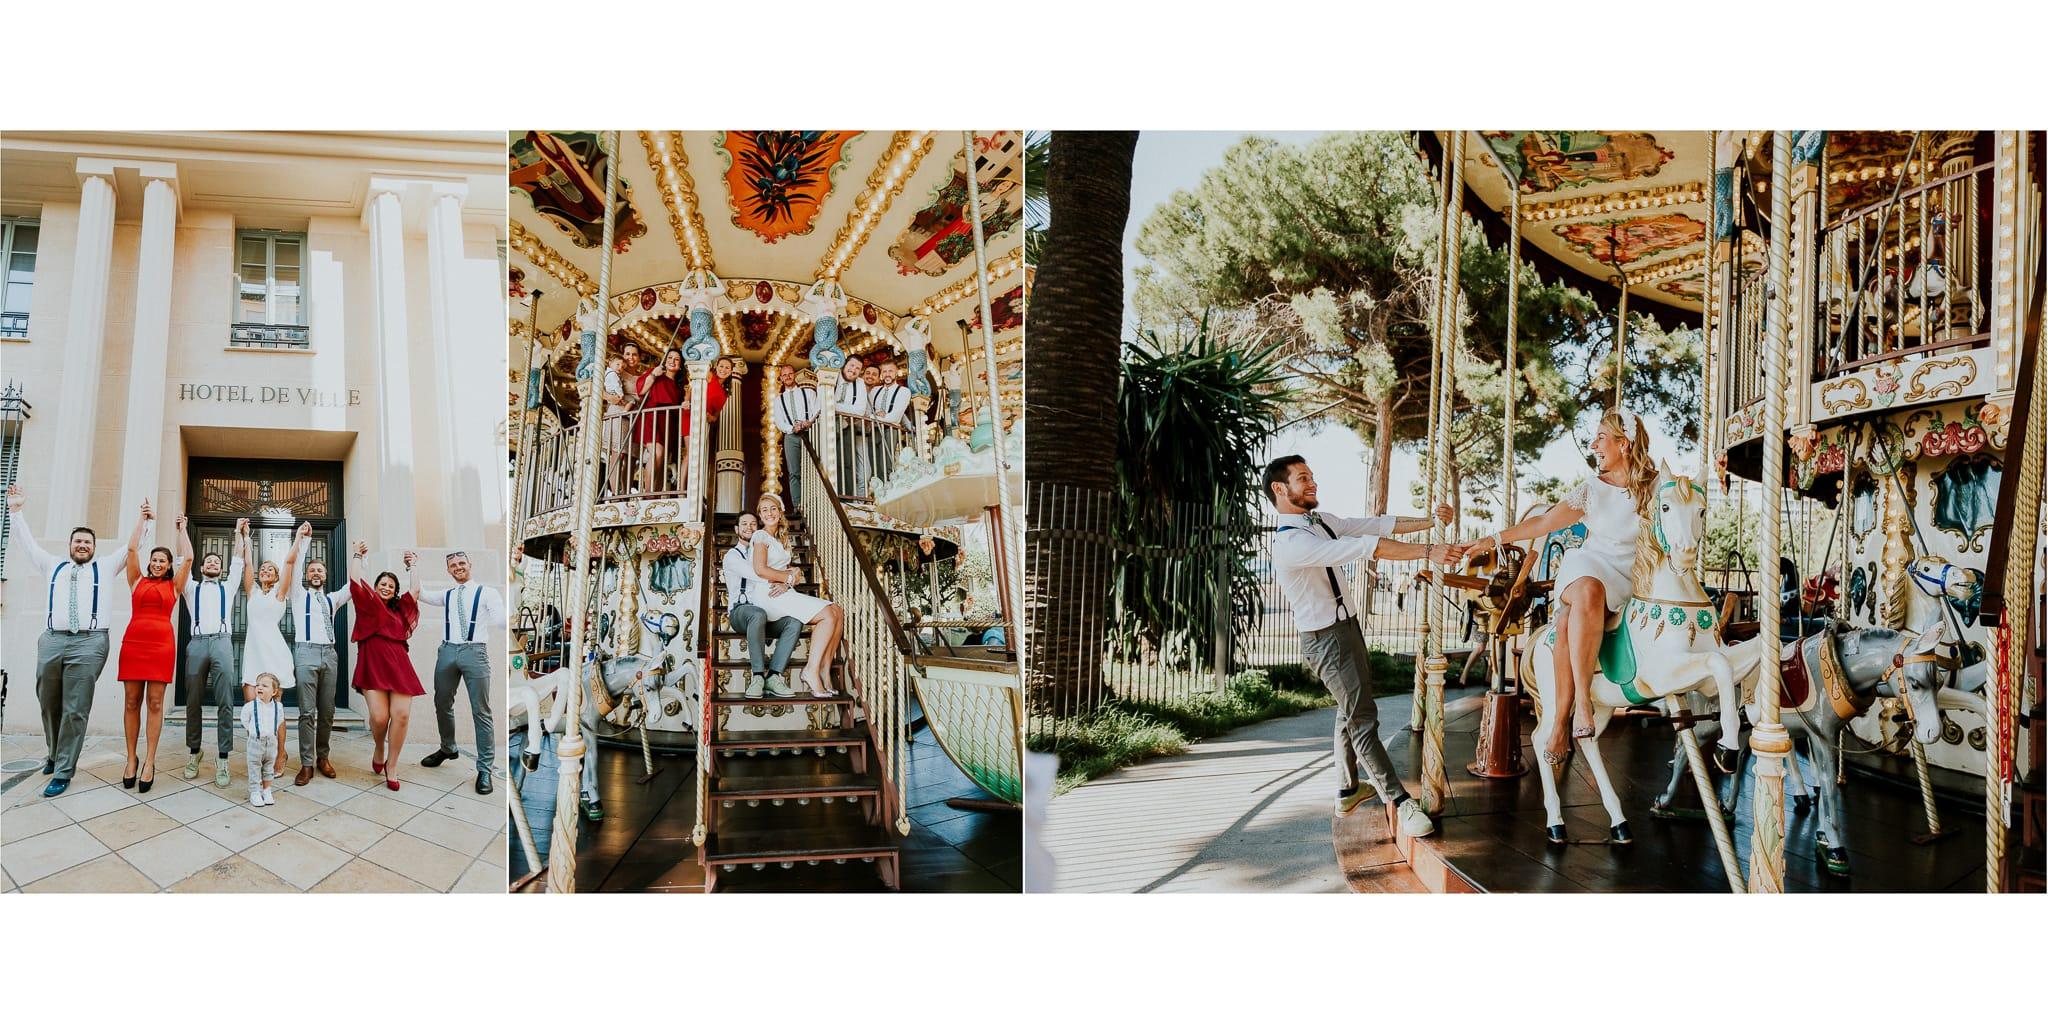 Costi-Moiceanu-Photographer-CM-Photography-Wedding-Mariage-French-Riviera-Cote-D-Azur-Alpes-Maritimes-Weding-Album-Design-2